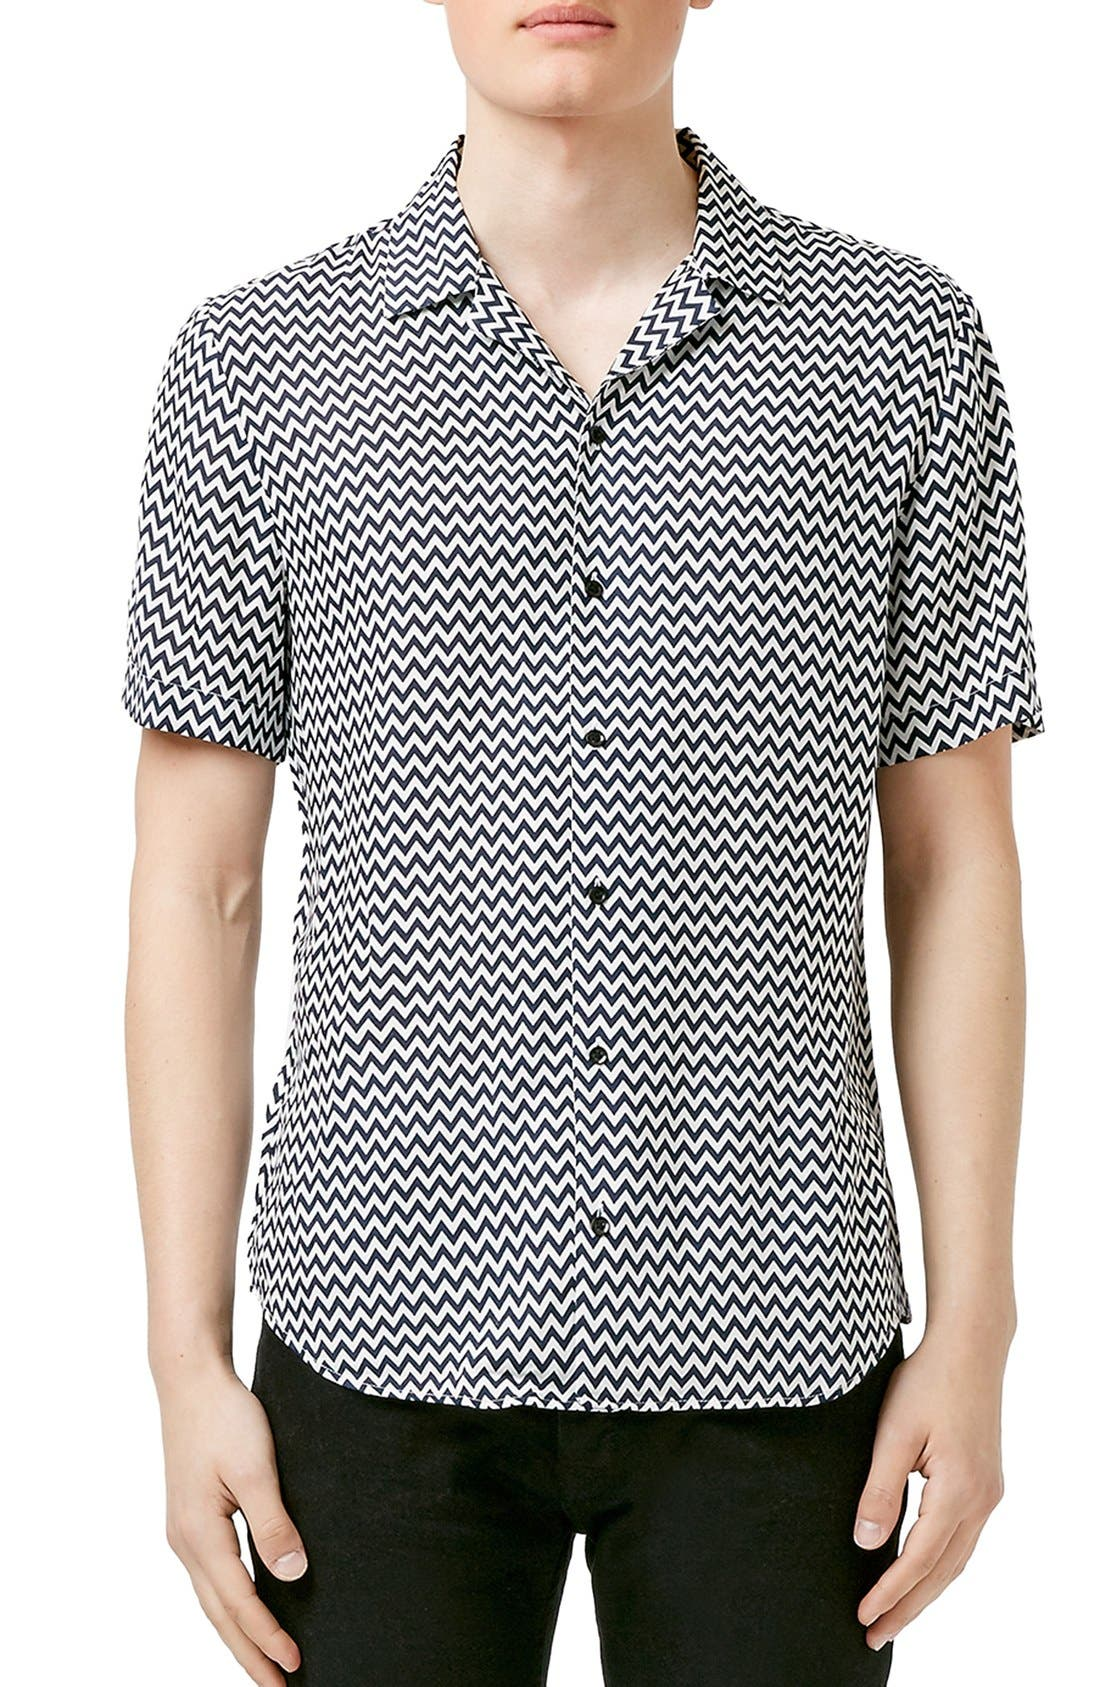 Main Image - Topman Zigzag Print Short Sleeve Revere Collar Shirt